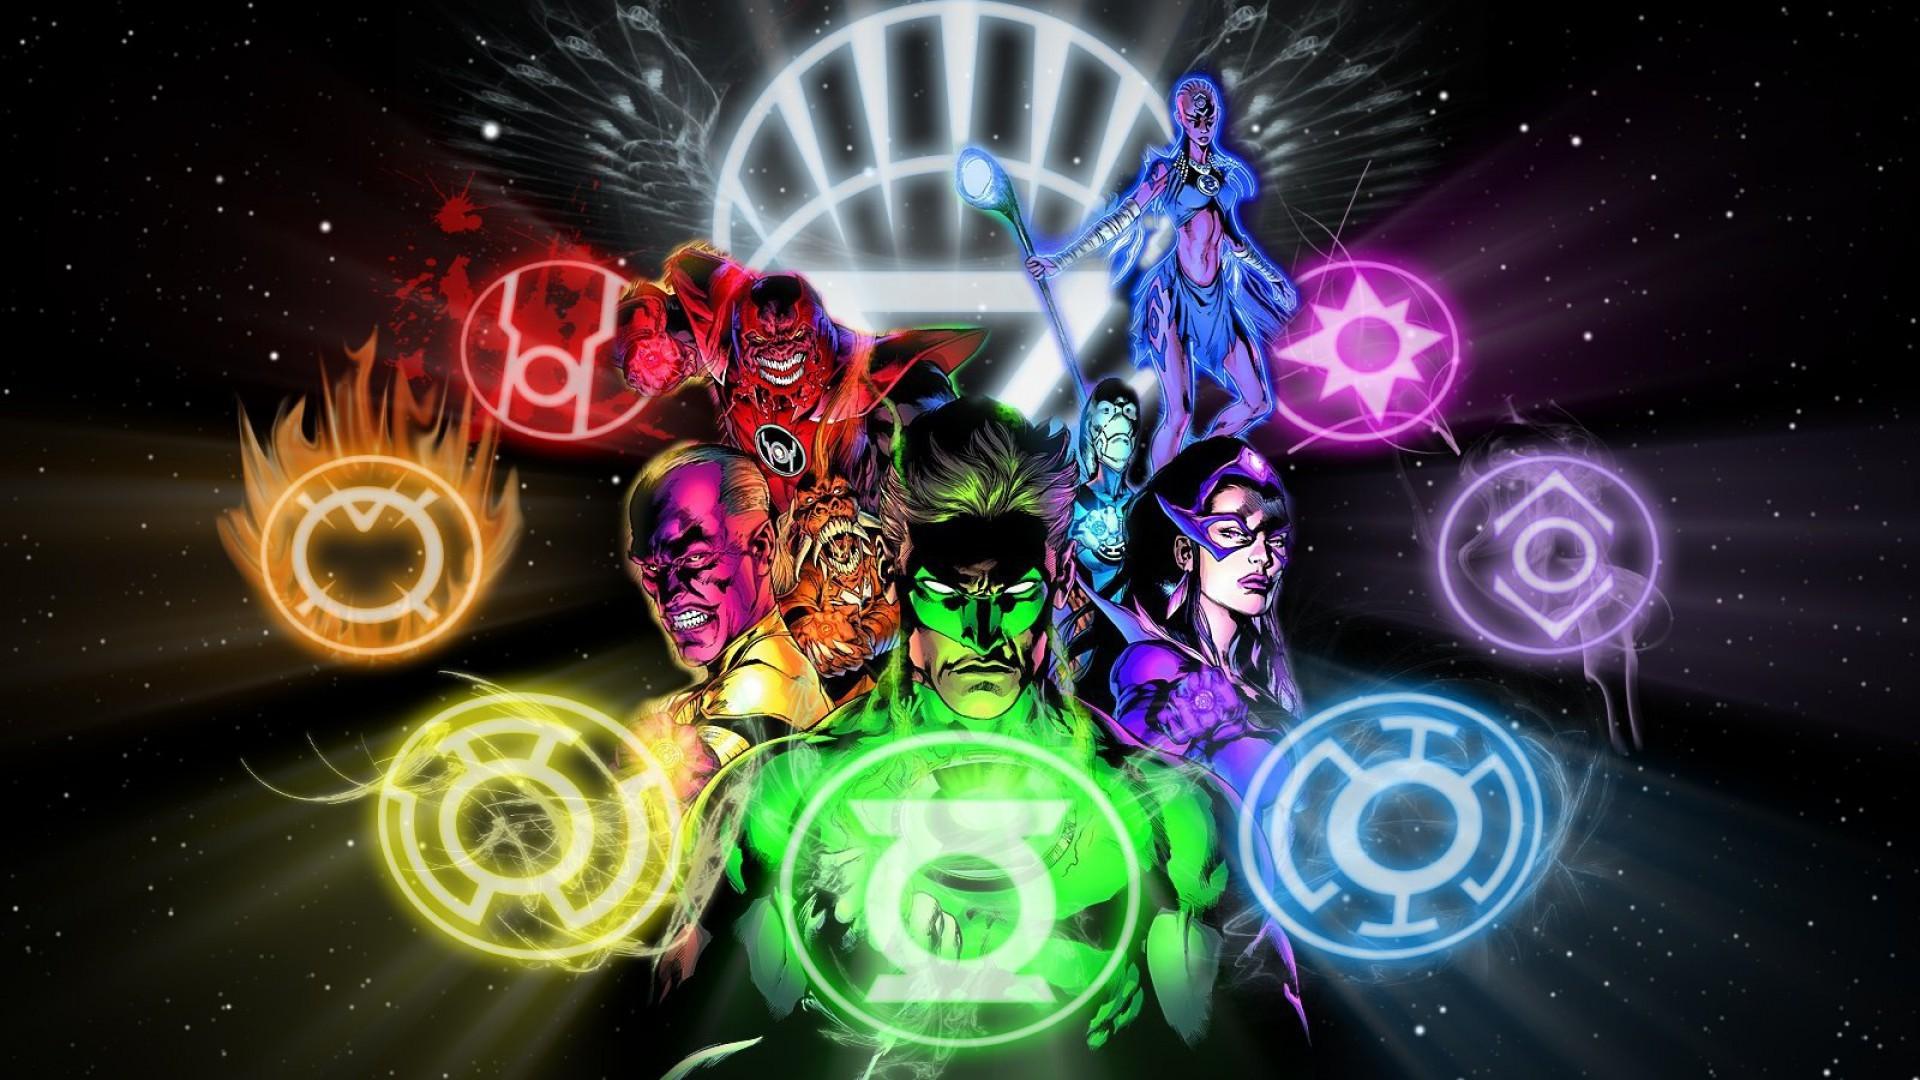 Res: 1920x1080, Green Lantern DC Comics White Lantern Larfleeze Atrocitus Blackest Night  Saint Walker sinestro